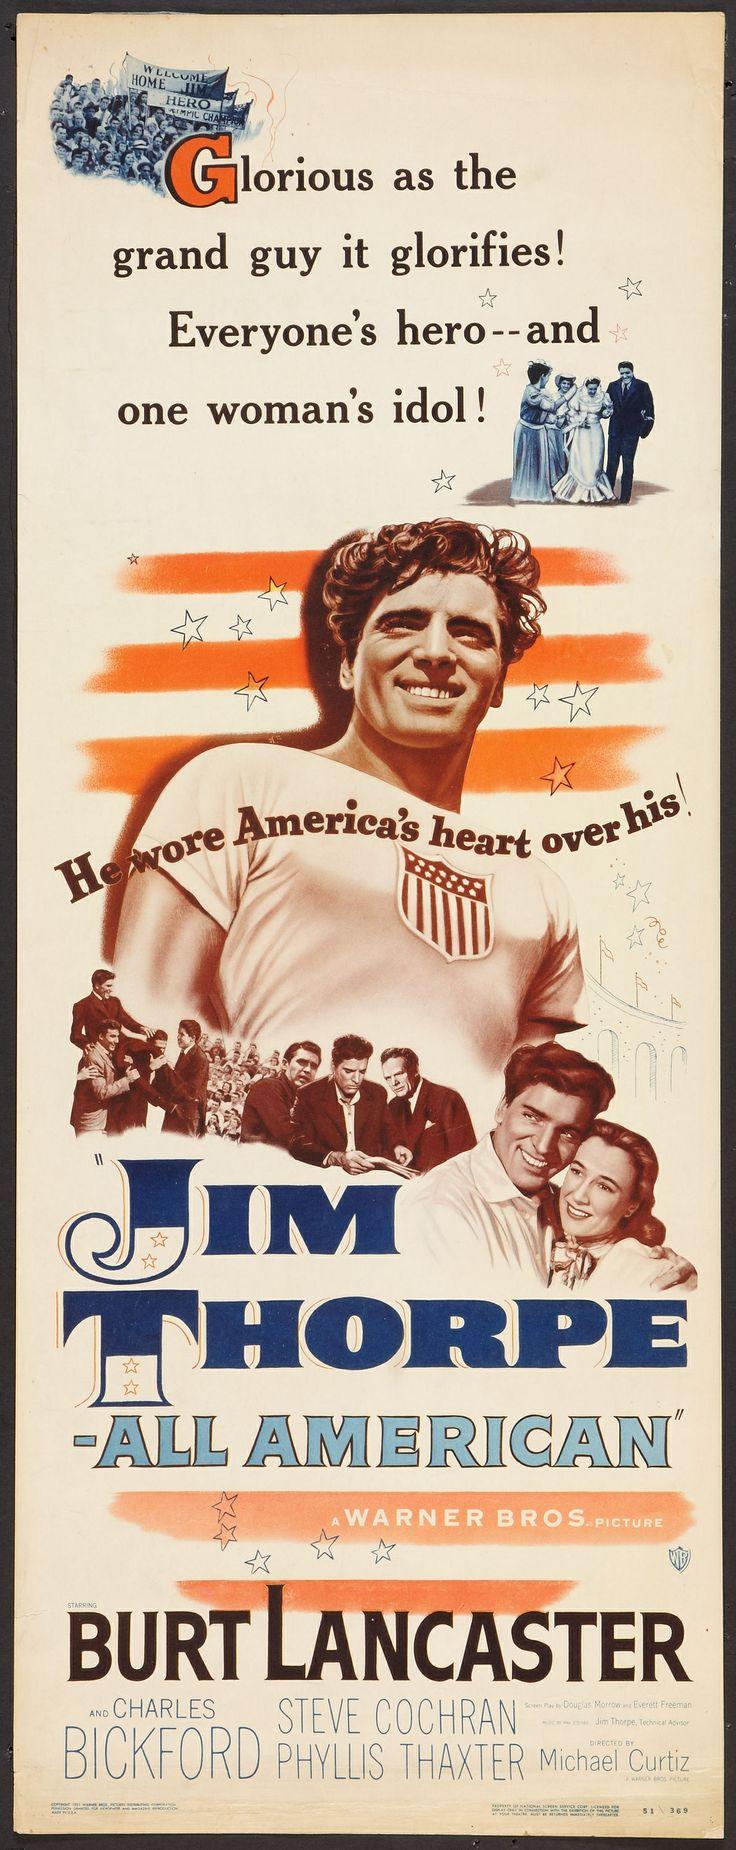 JIM THORPE, ALL AMERICAN (1952) - Burt Lancaster - Charles Bickford - Steve Cochran - Phyliss Thaxter -Directed by Michael Curtiz - Warner Bros. - Insert Movie Poster.